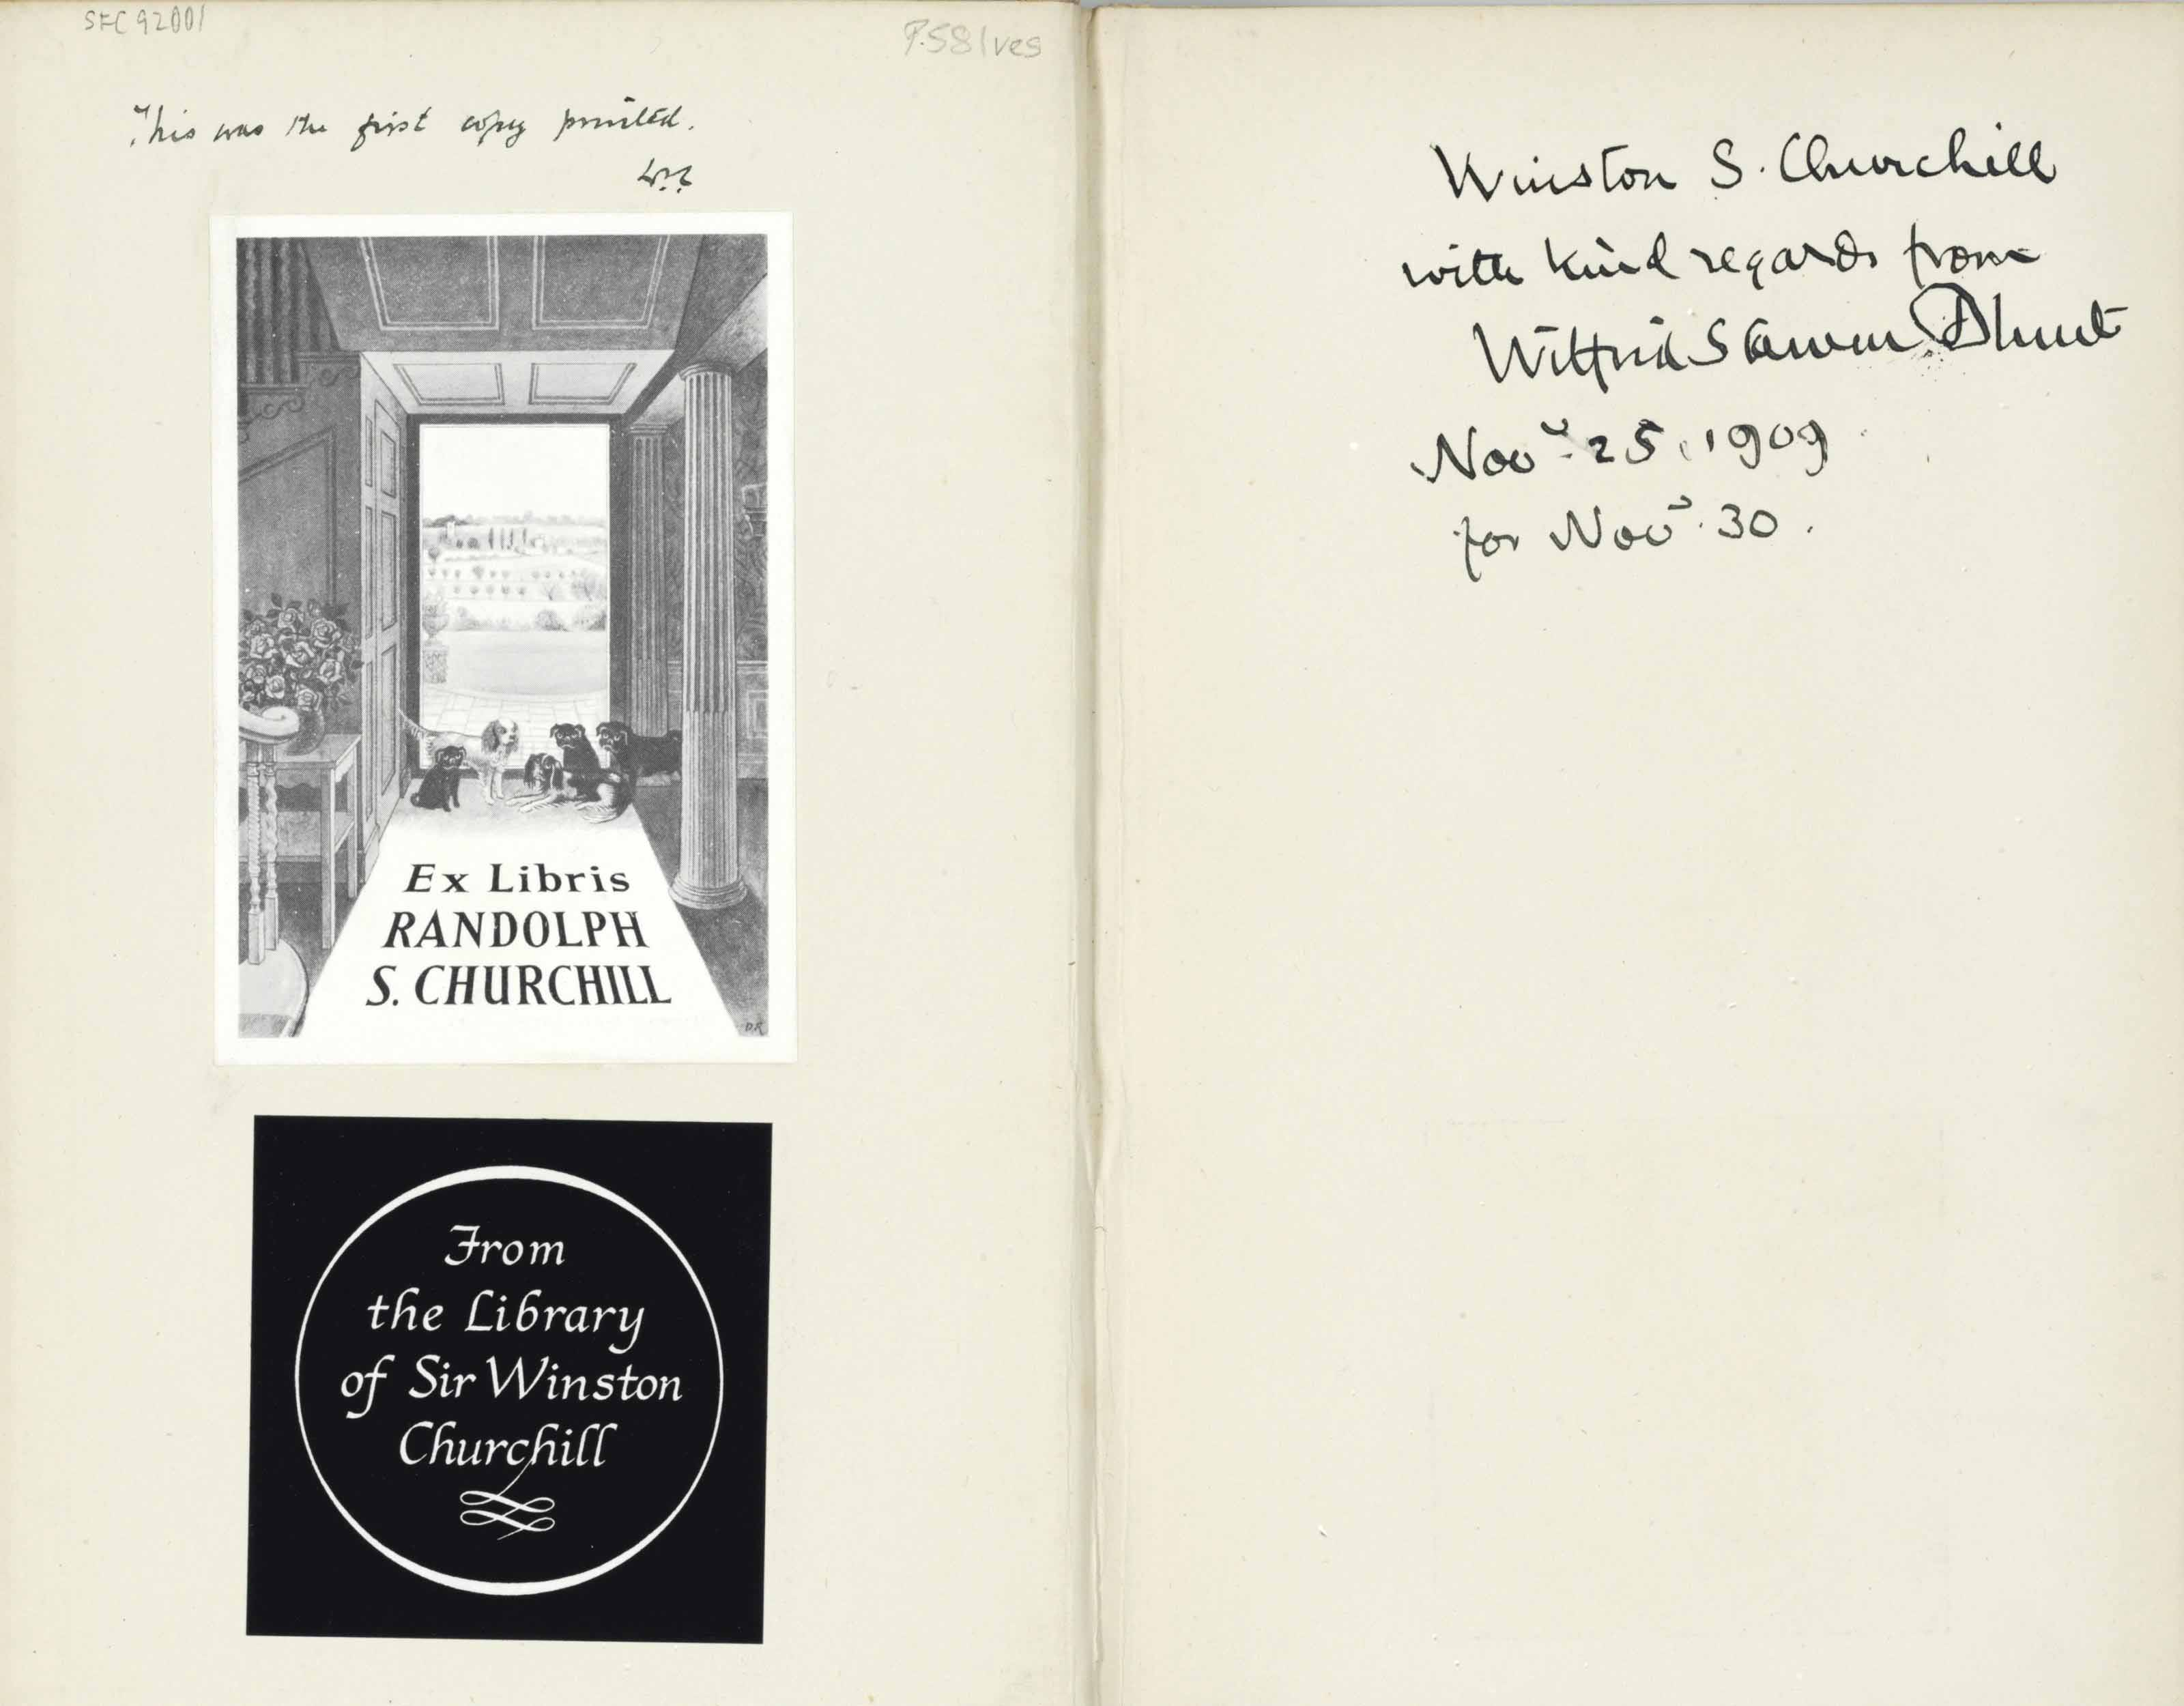 [CHURCHILL, Winston S., his copy]. BLUNT, Wilfrid S. India Under Ripon. London: T. Fisher Unwin, 1909.